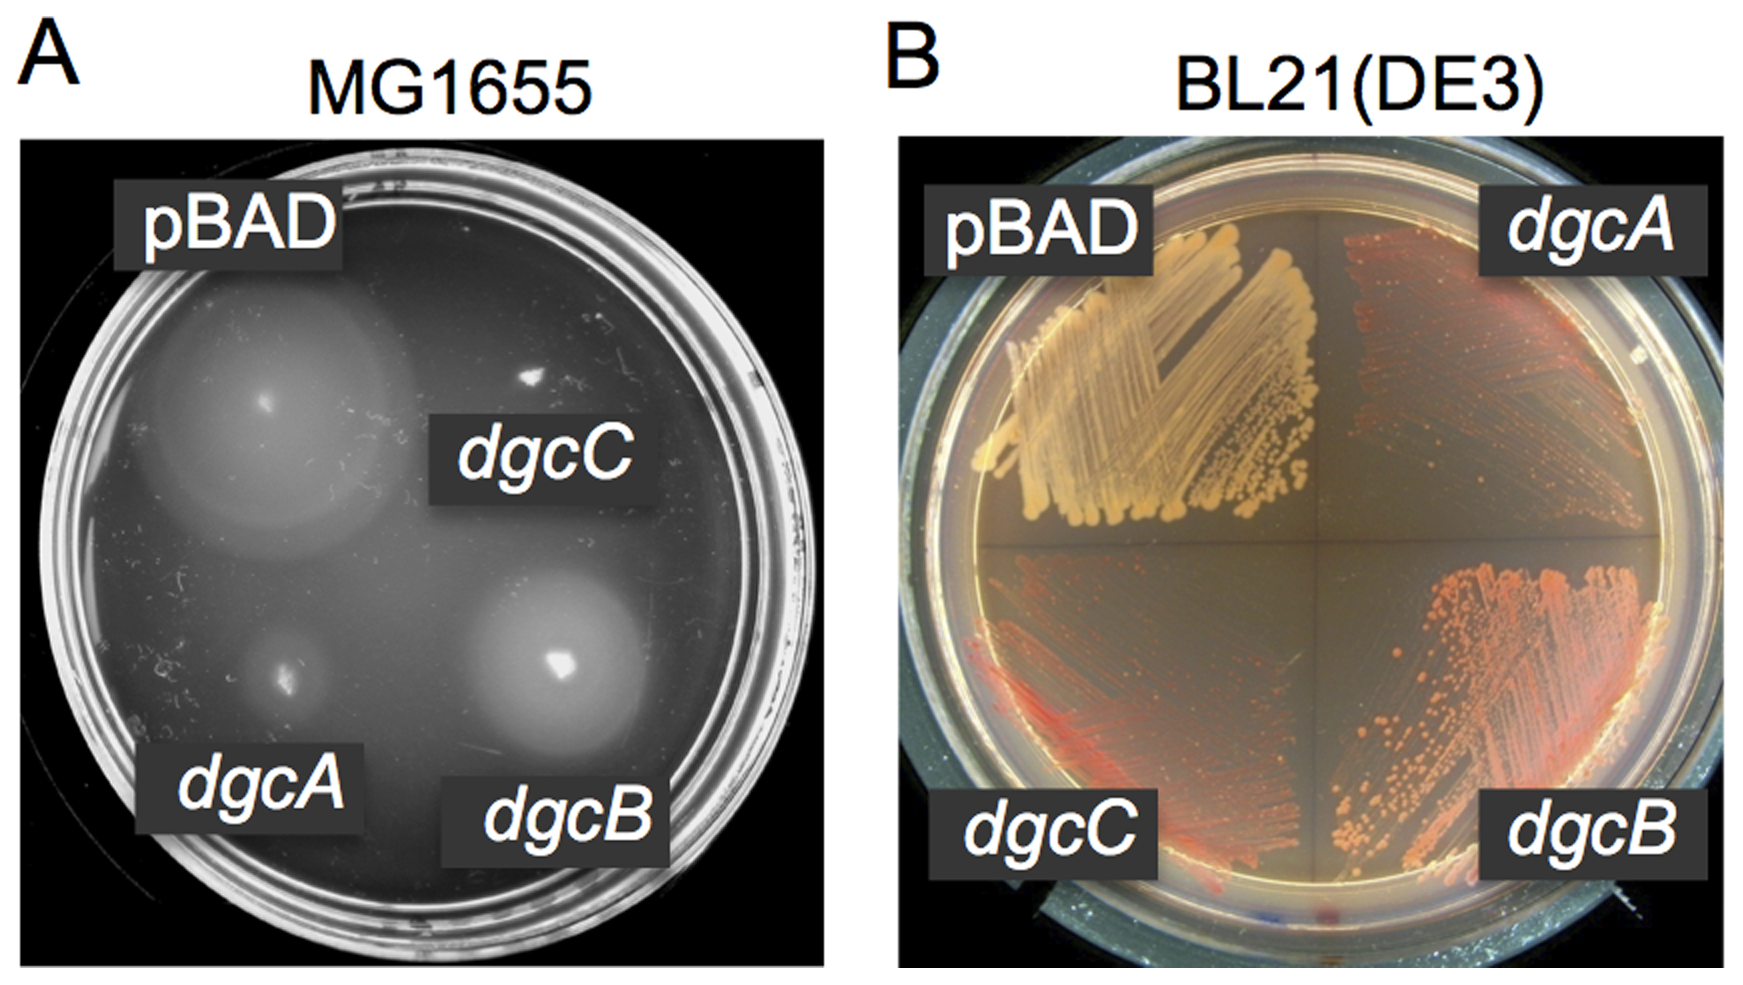 DGC activities of the <i>L. monocytogenes</i> proteins DgcA-C.